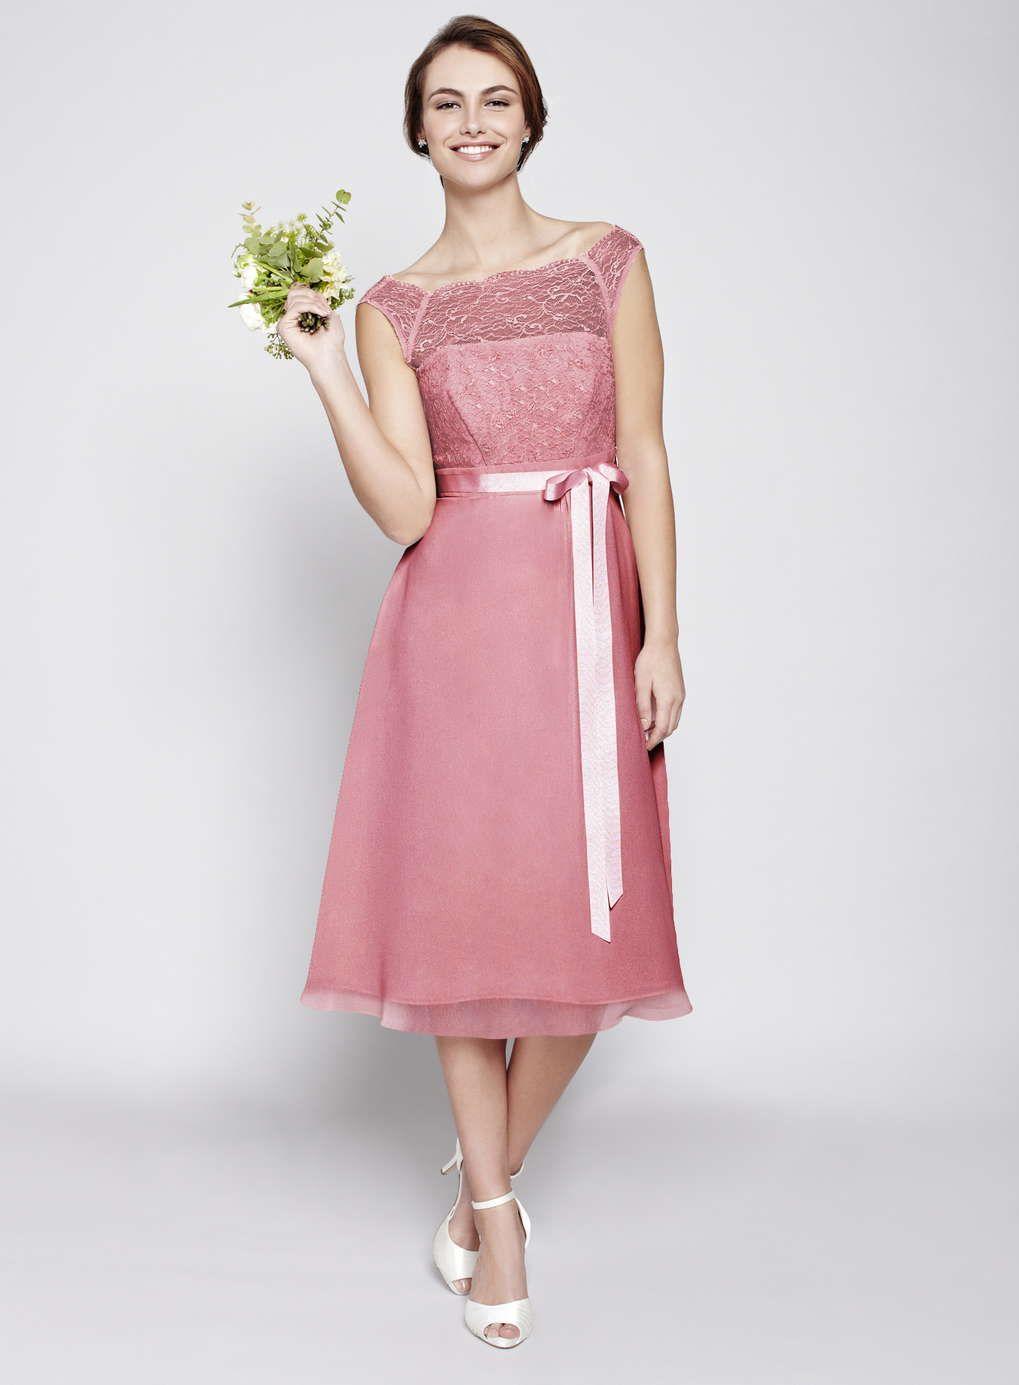 Rose chloe bridesmaid dress bridesmaid wedding bhs xx kate rose chloe bridesmaid dress bridesmaid wedding bhs ombrellifo Image collections